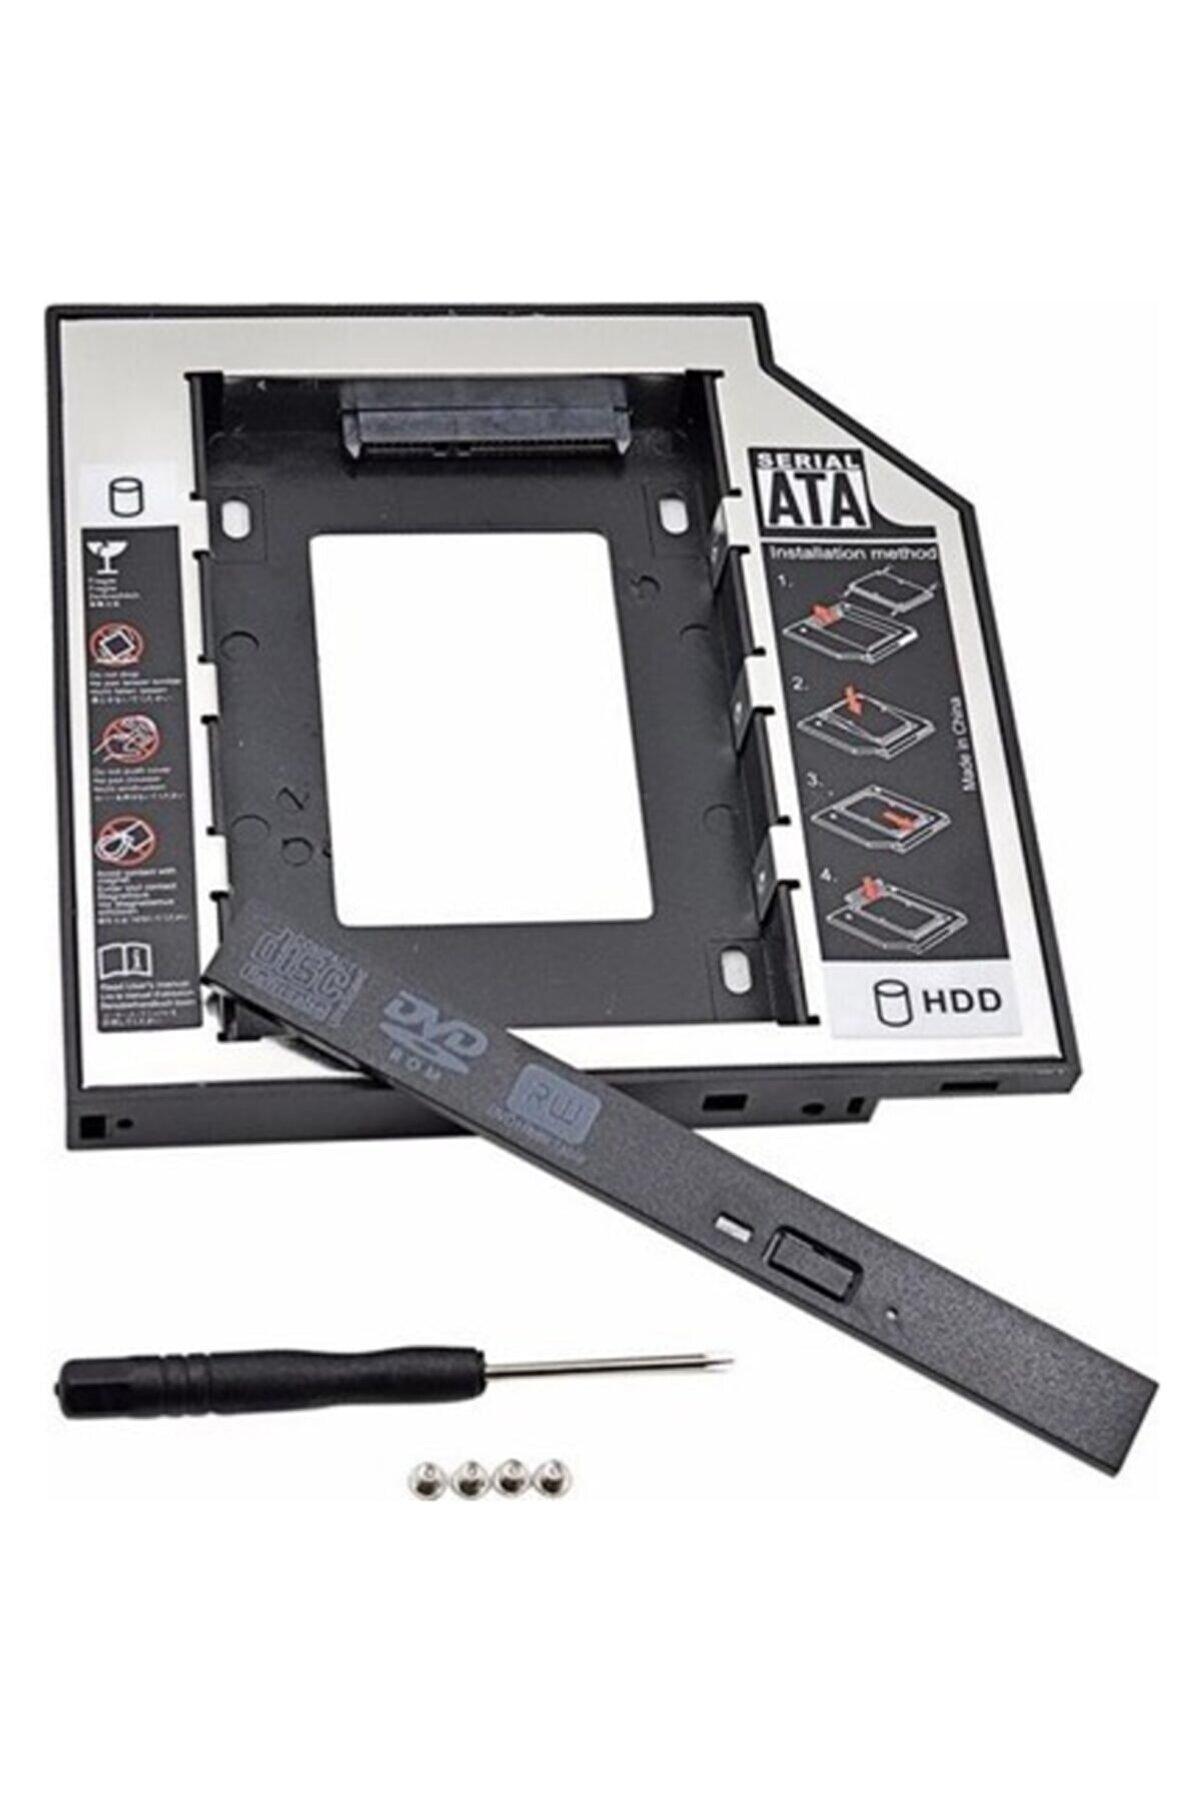 Notespare 12.7mm Hdd Caddy Kızak Laptop Dvd To Ssd Kutu Sata 4717p